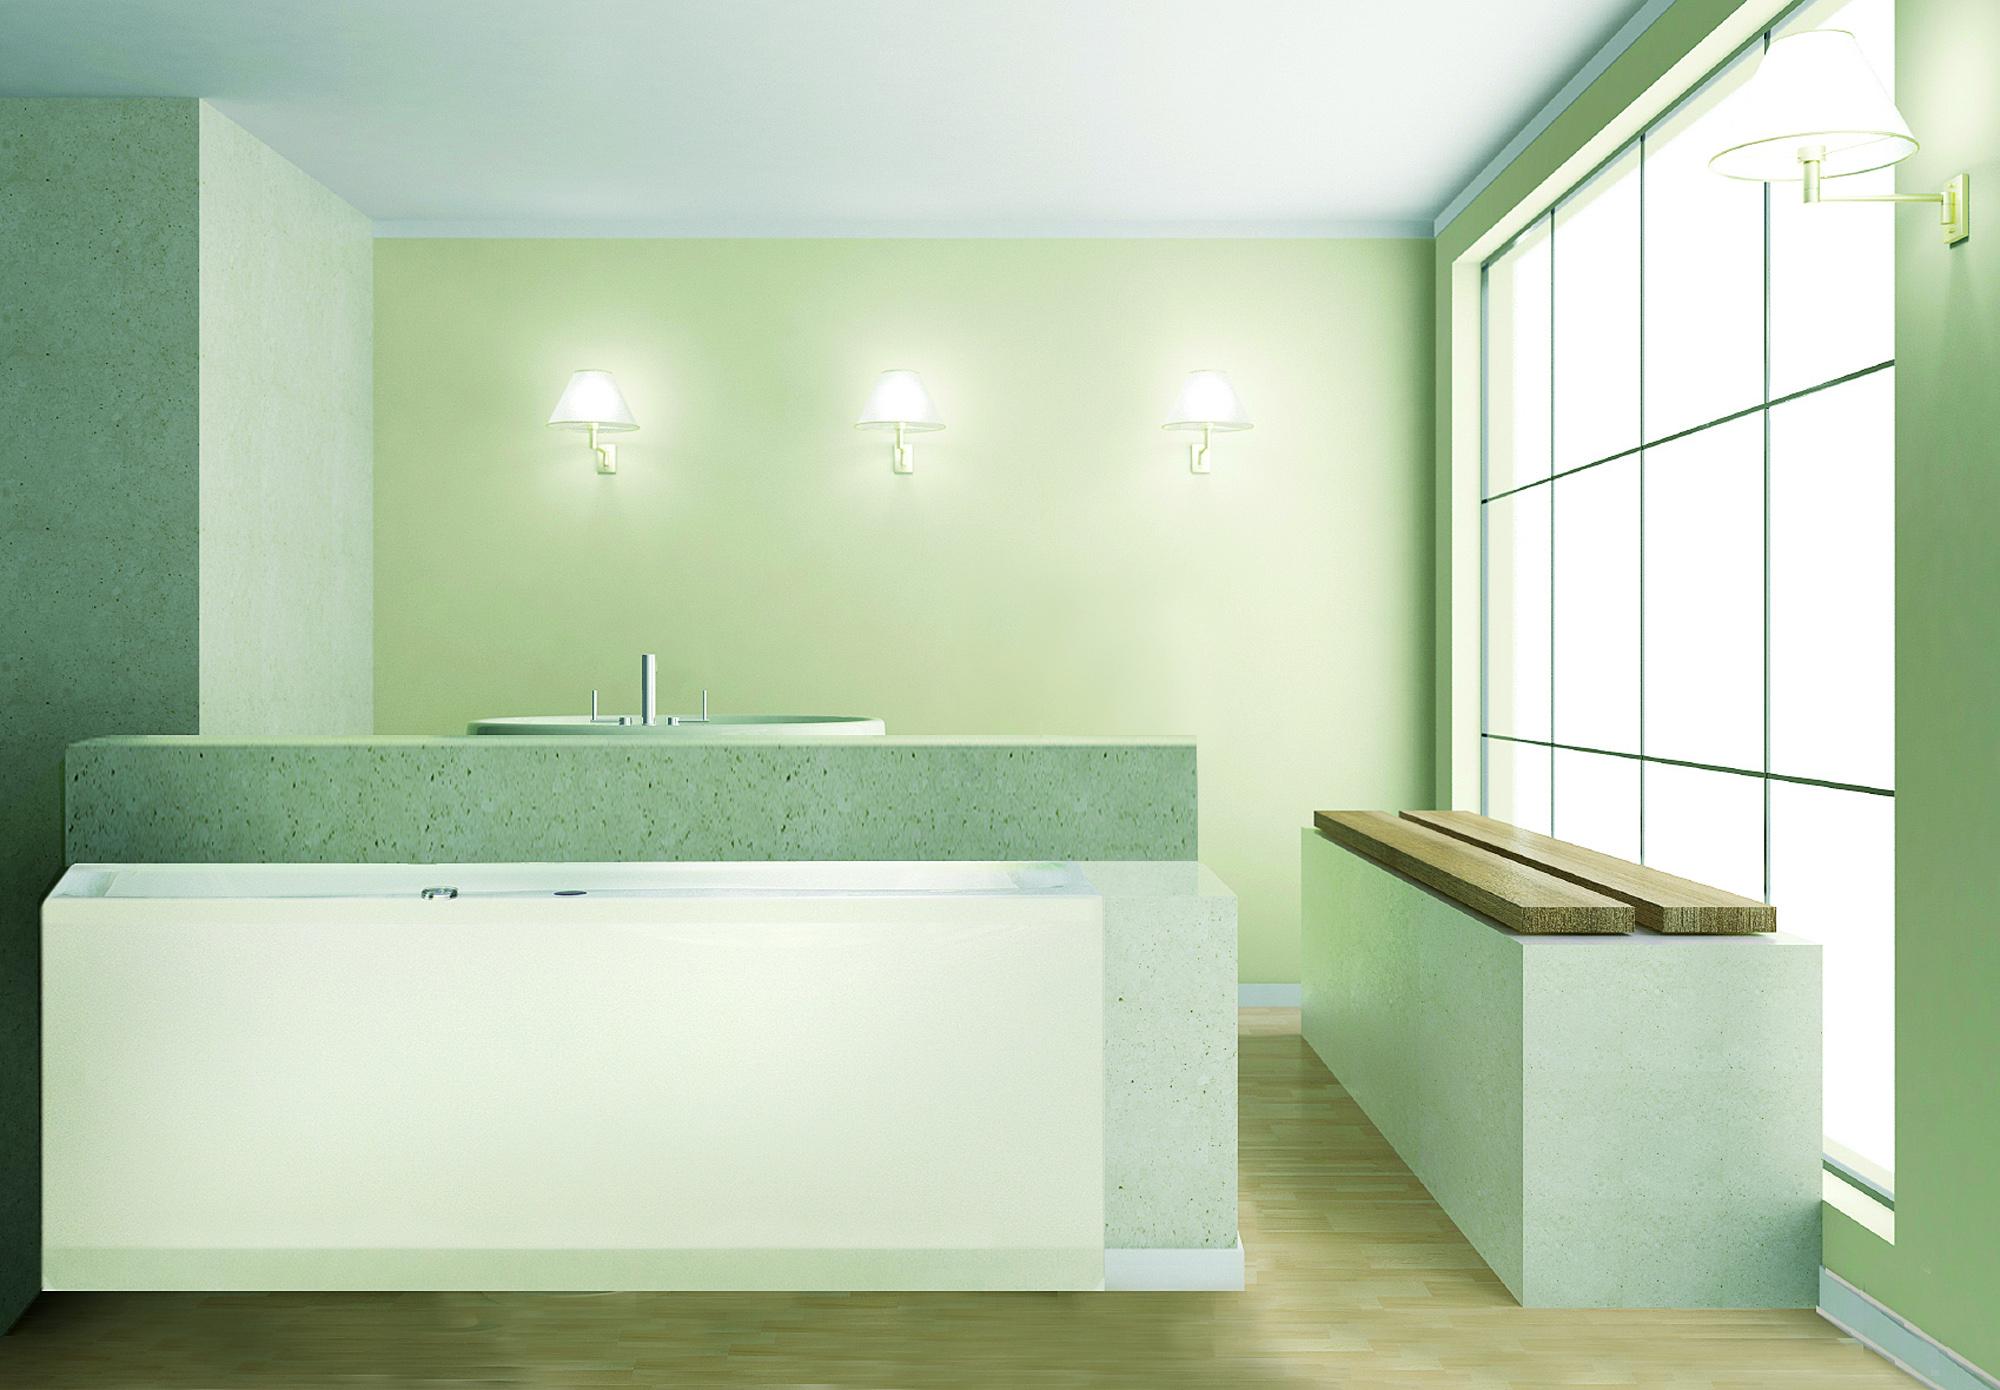 baignoire baln o rectangulaire kendo rexus 190x90. Black Bedroom Furniture Sets. Home Design Ideas